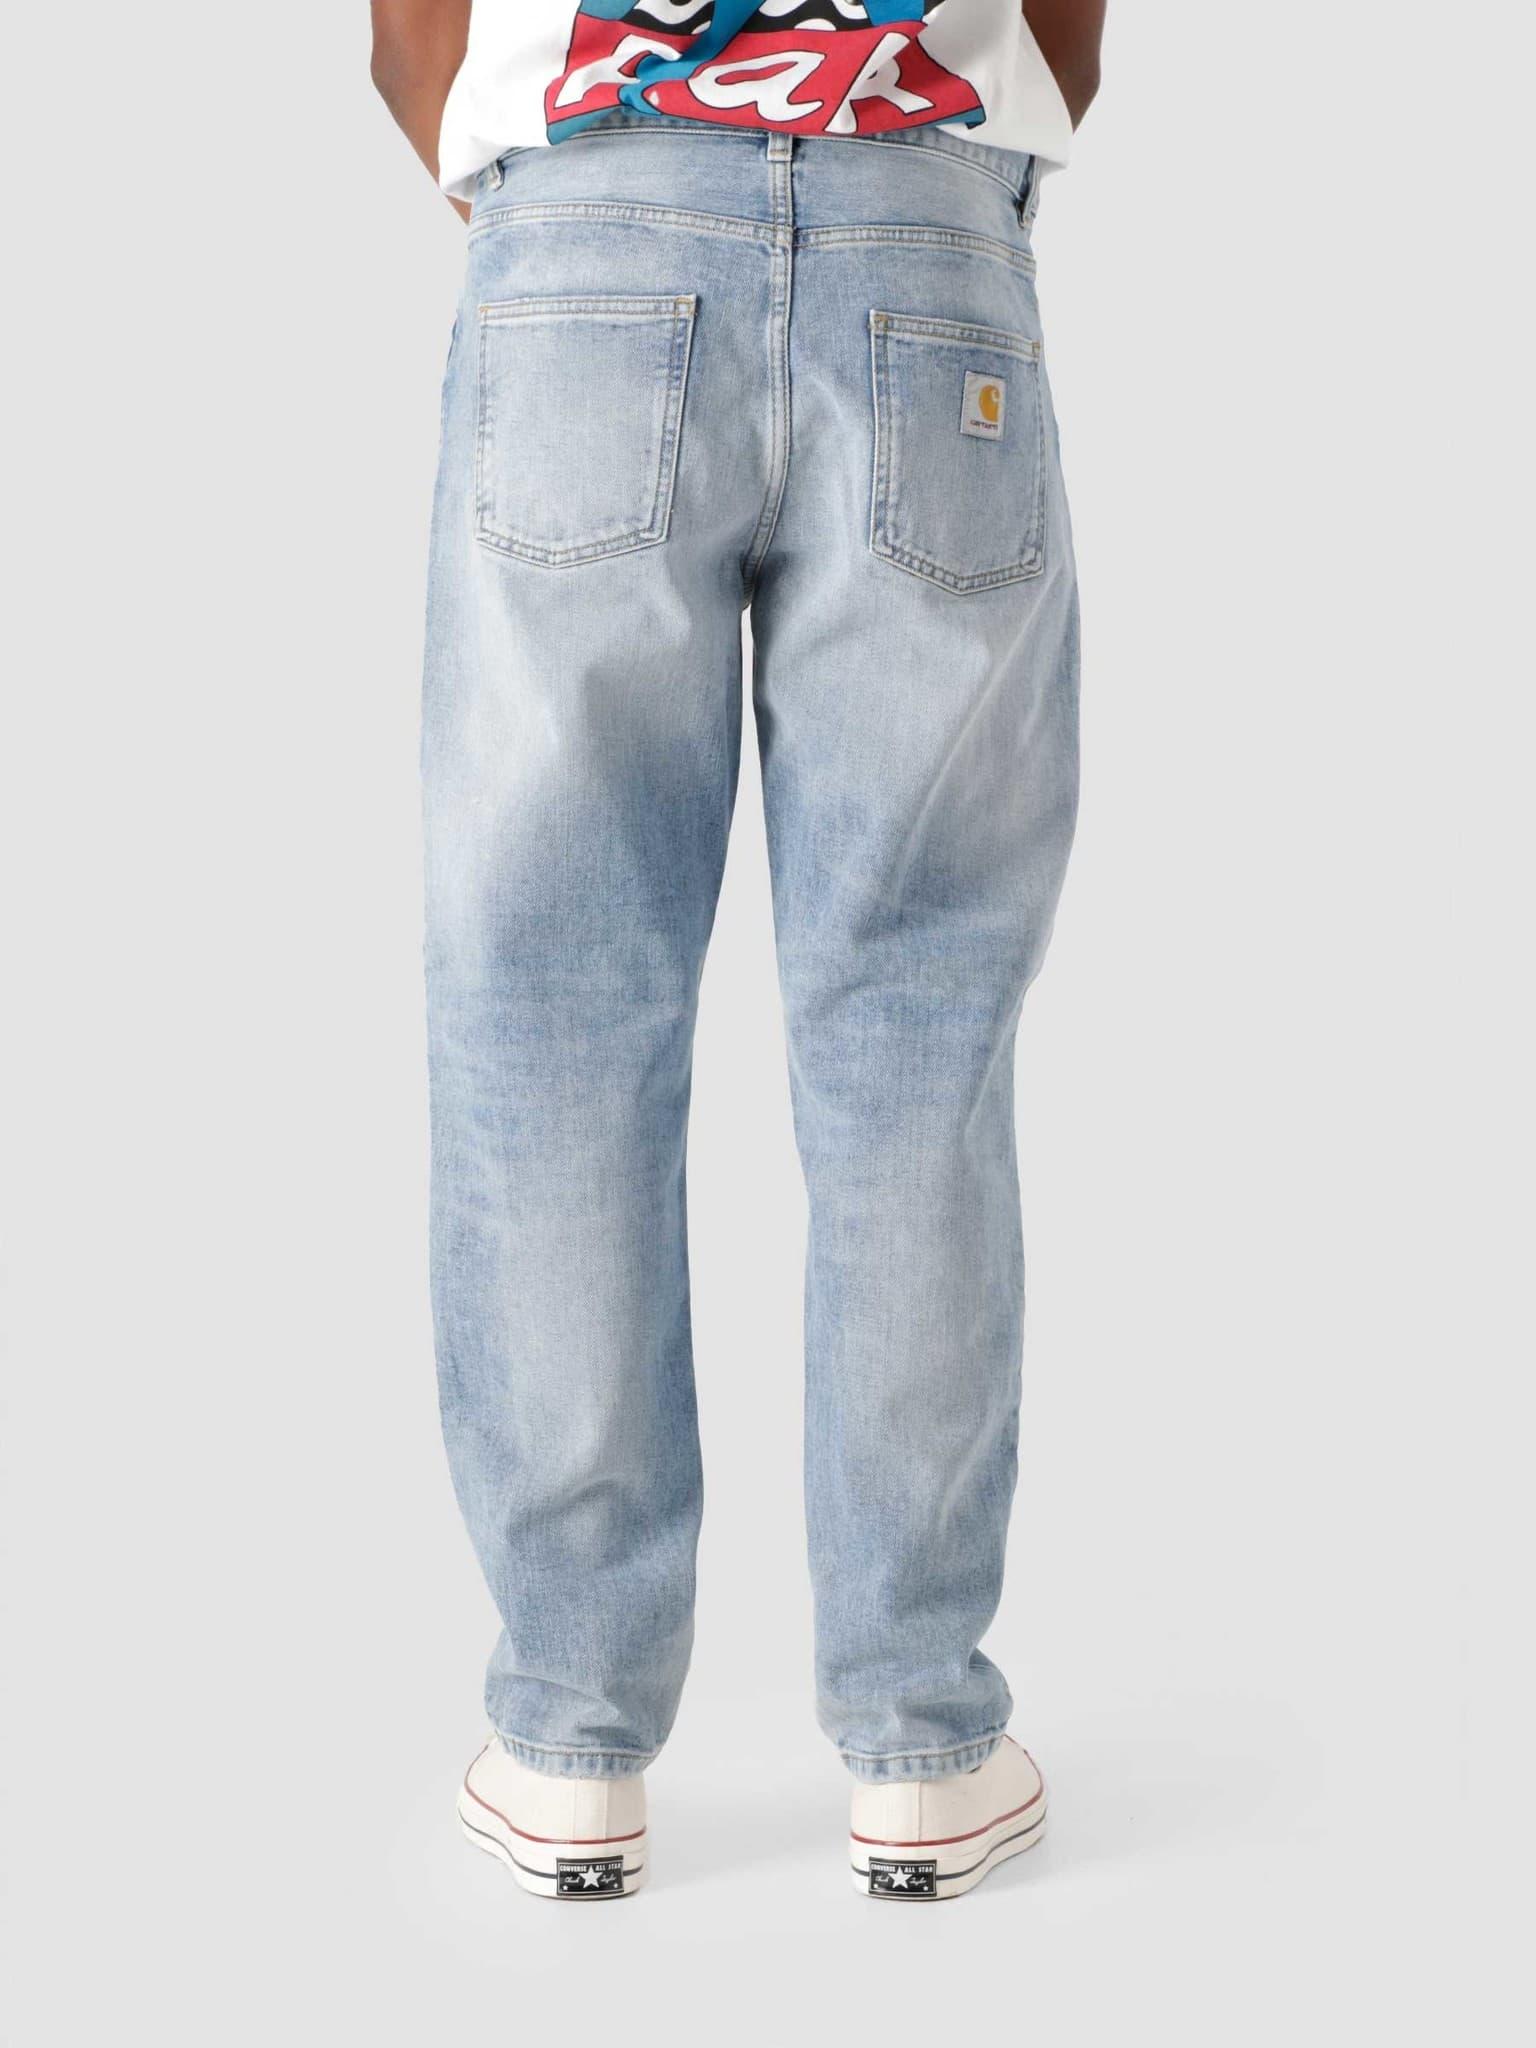 Newel Pant Blue Light Used Wash I029208-01WI